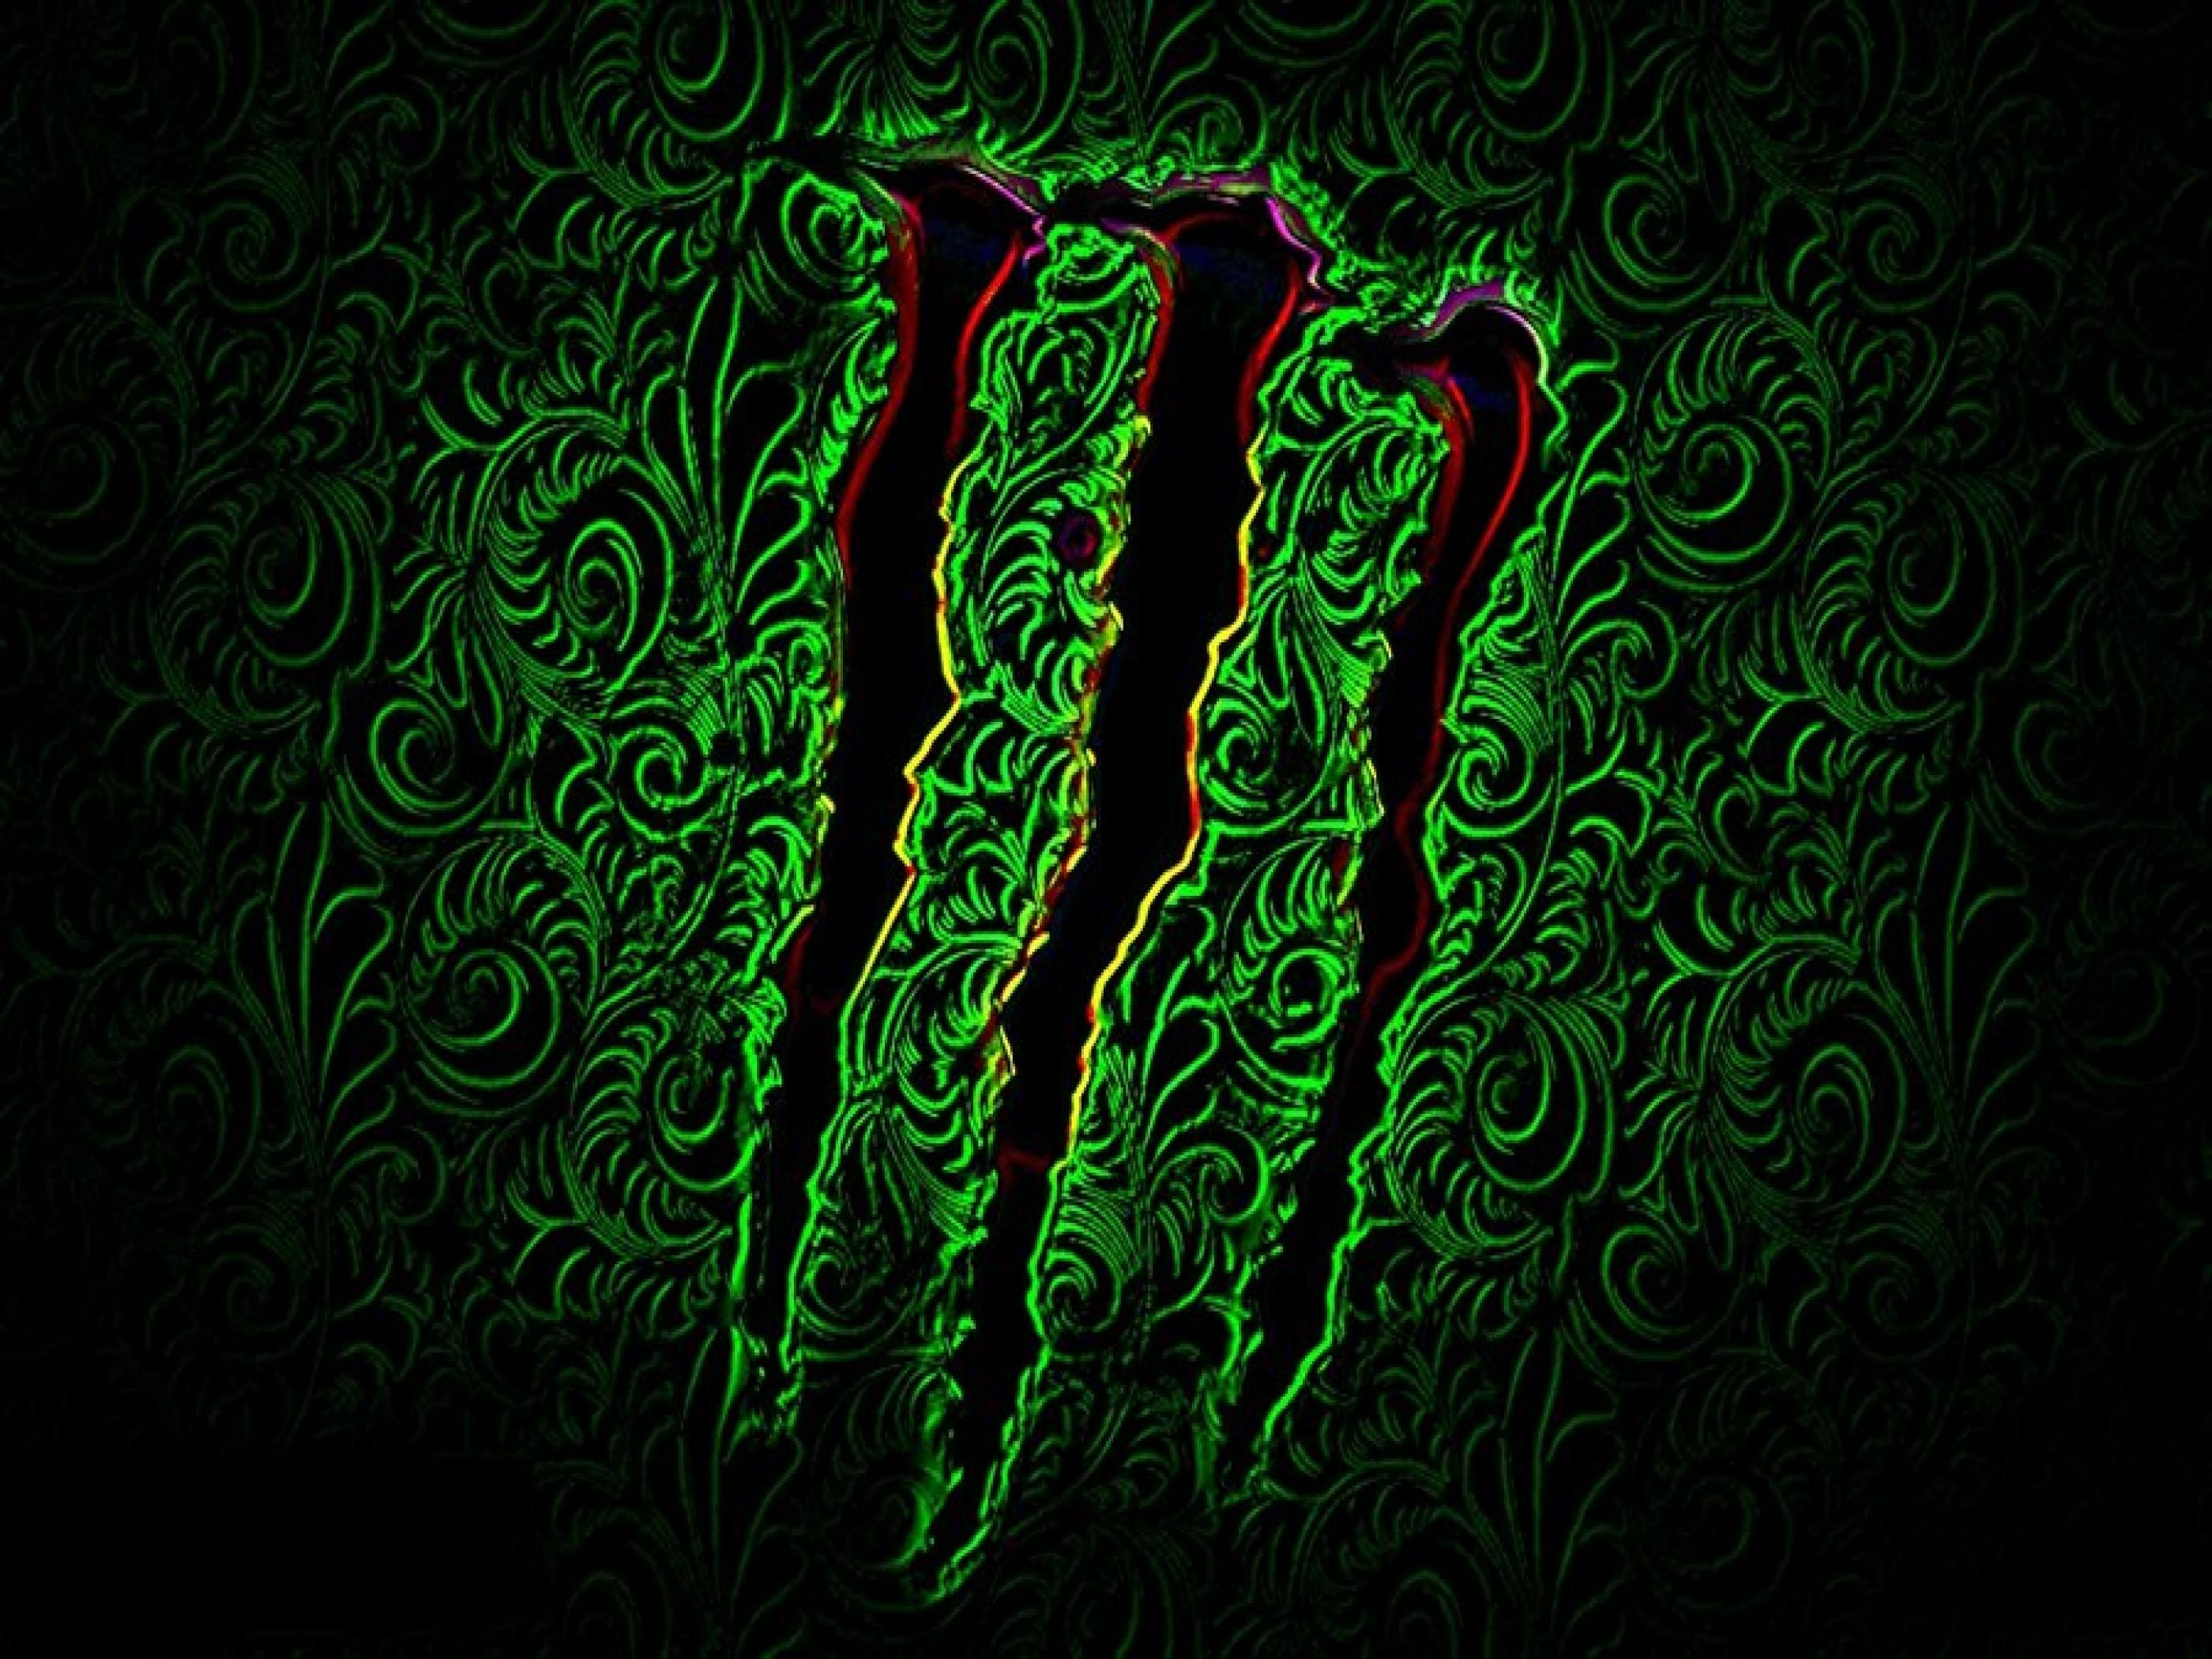 Monster logo wallpaper 70 images 1920x1080 dc shoes wallpaper voltagebd Gallery